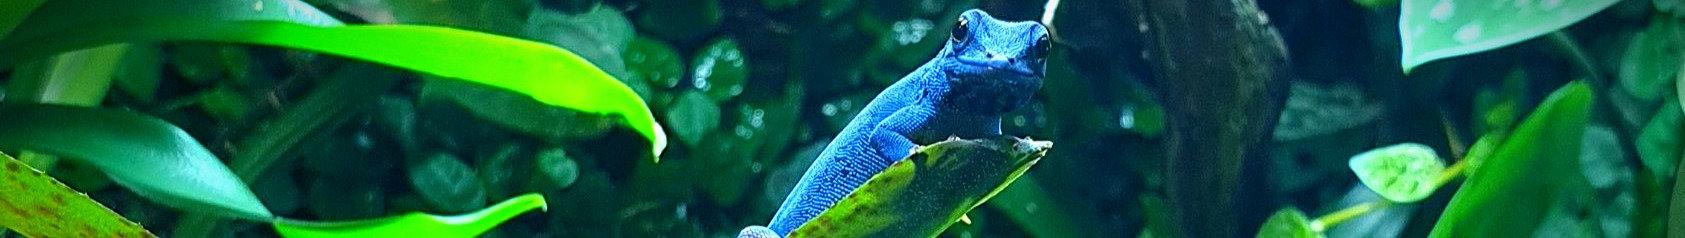 Lygodactylus williamsi - Himmelblauer Zweggecko